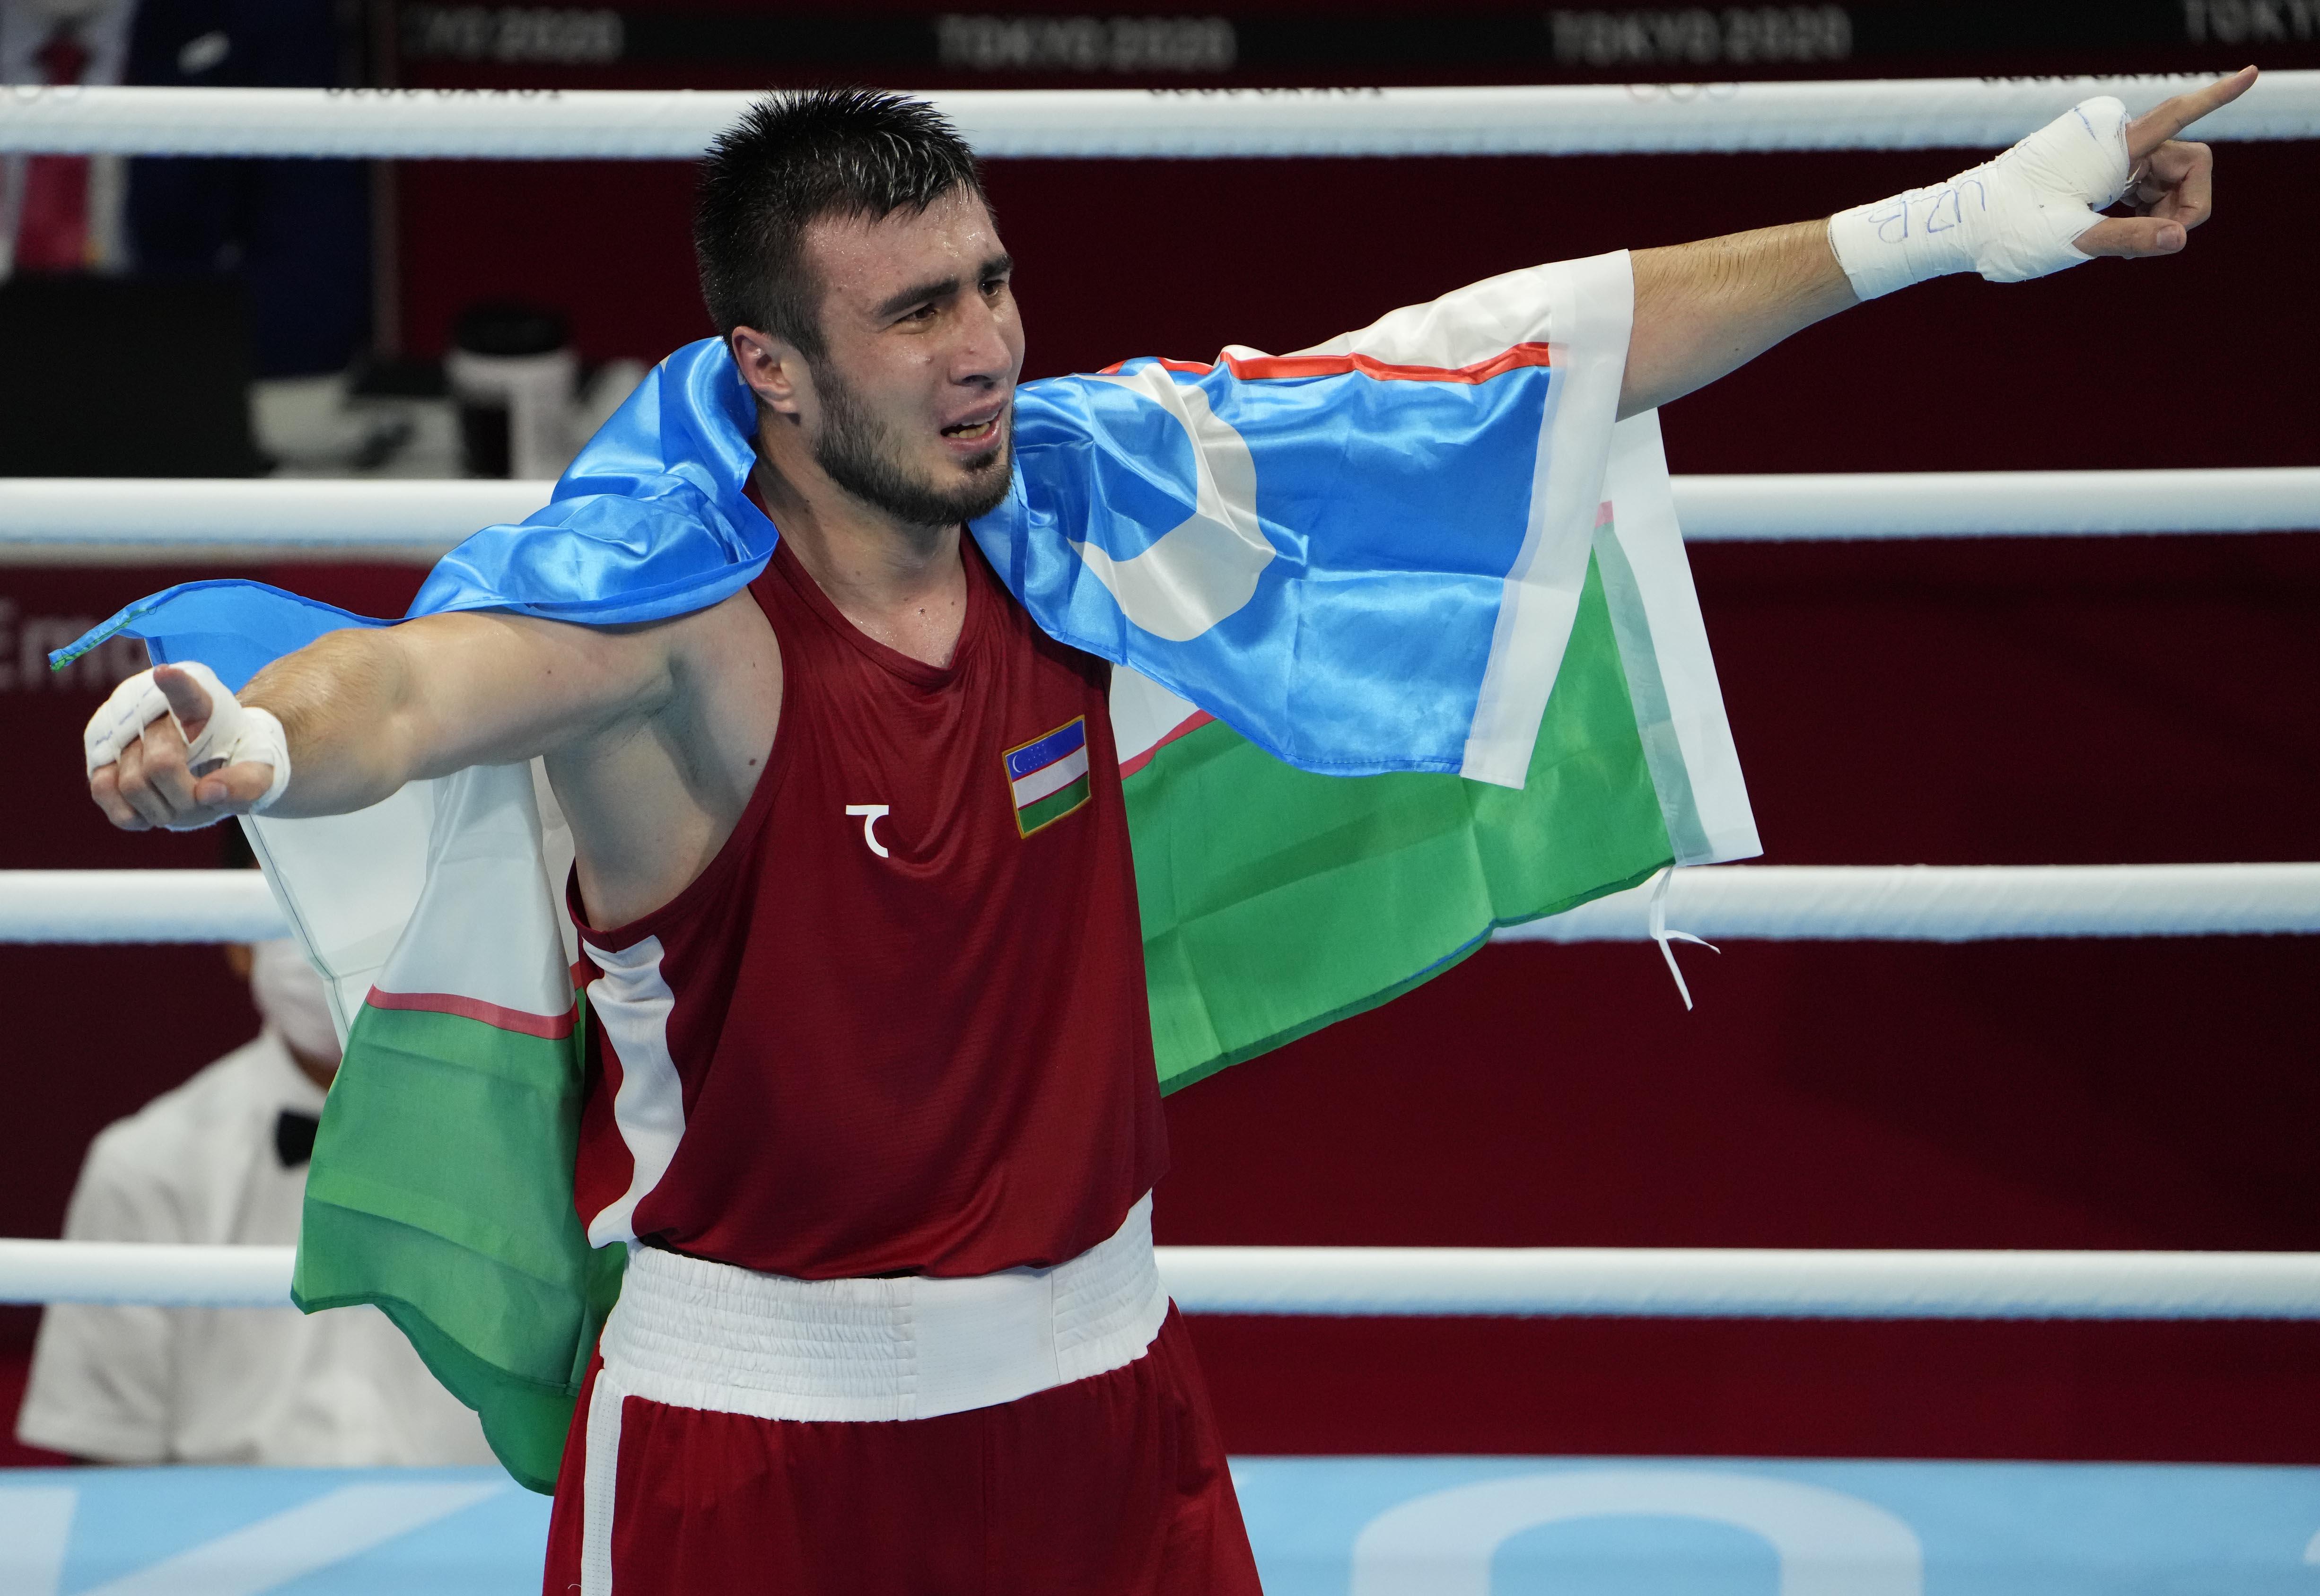 Bakhodir Jalolov of Uzbekistan becomes Olympic men's super heavyweight champion